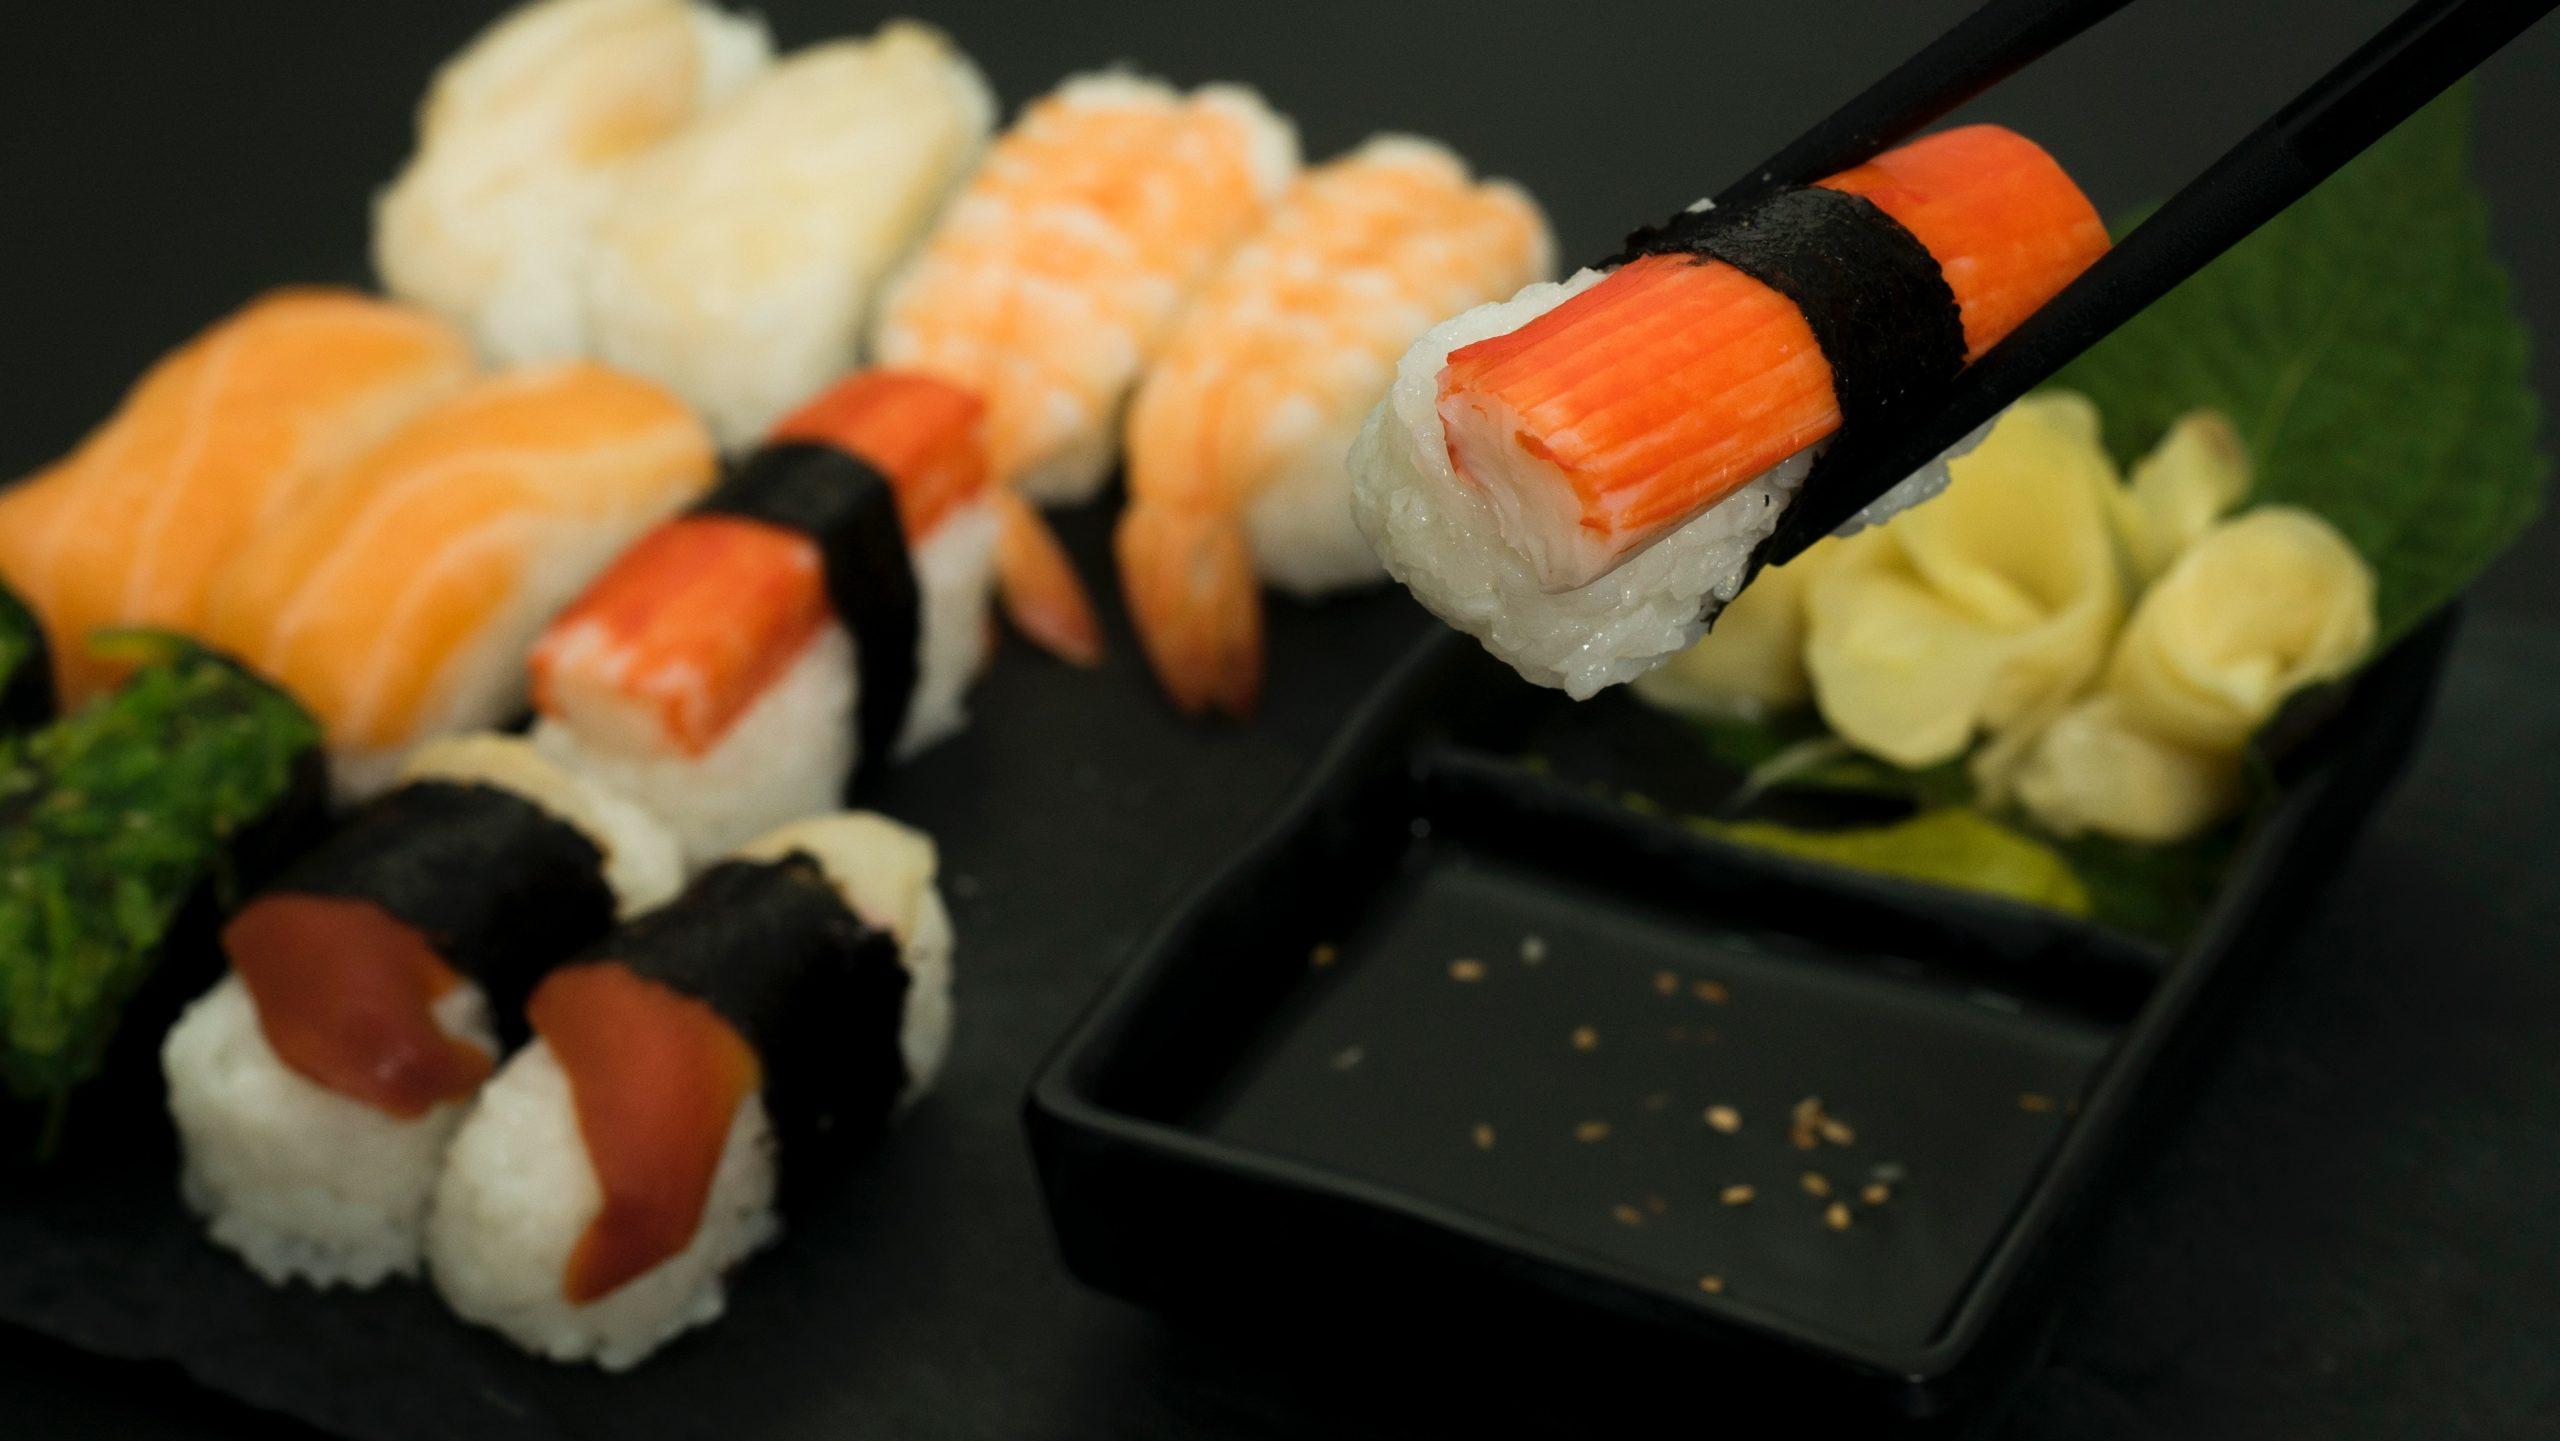 Shopping at Lidl sushi